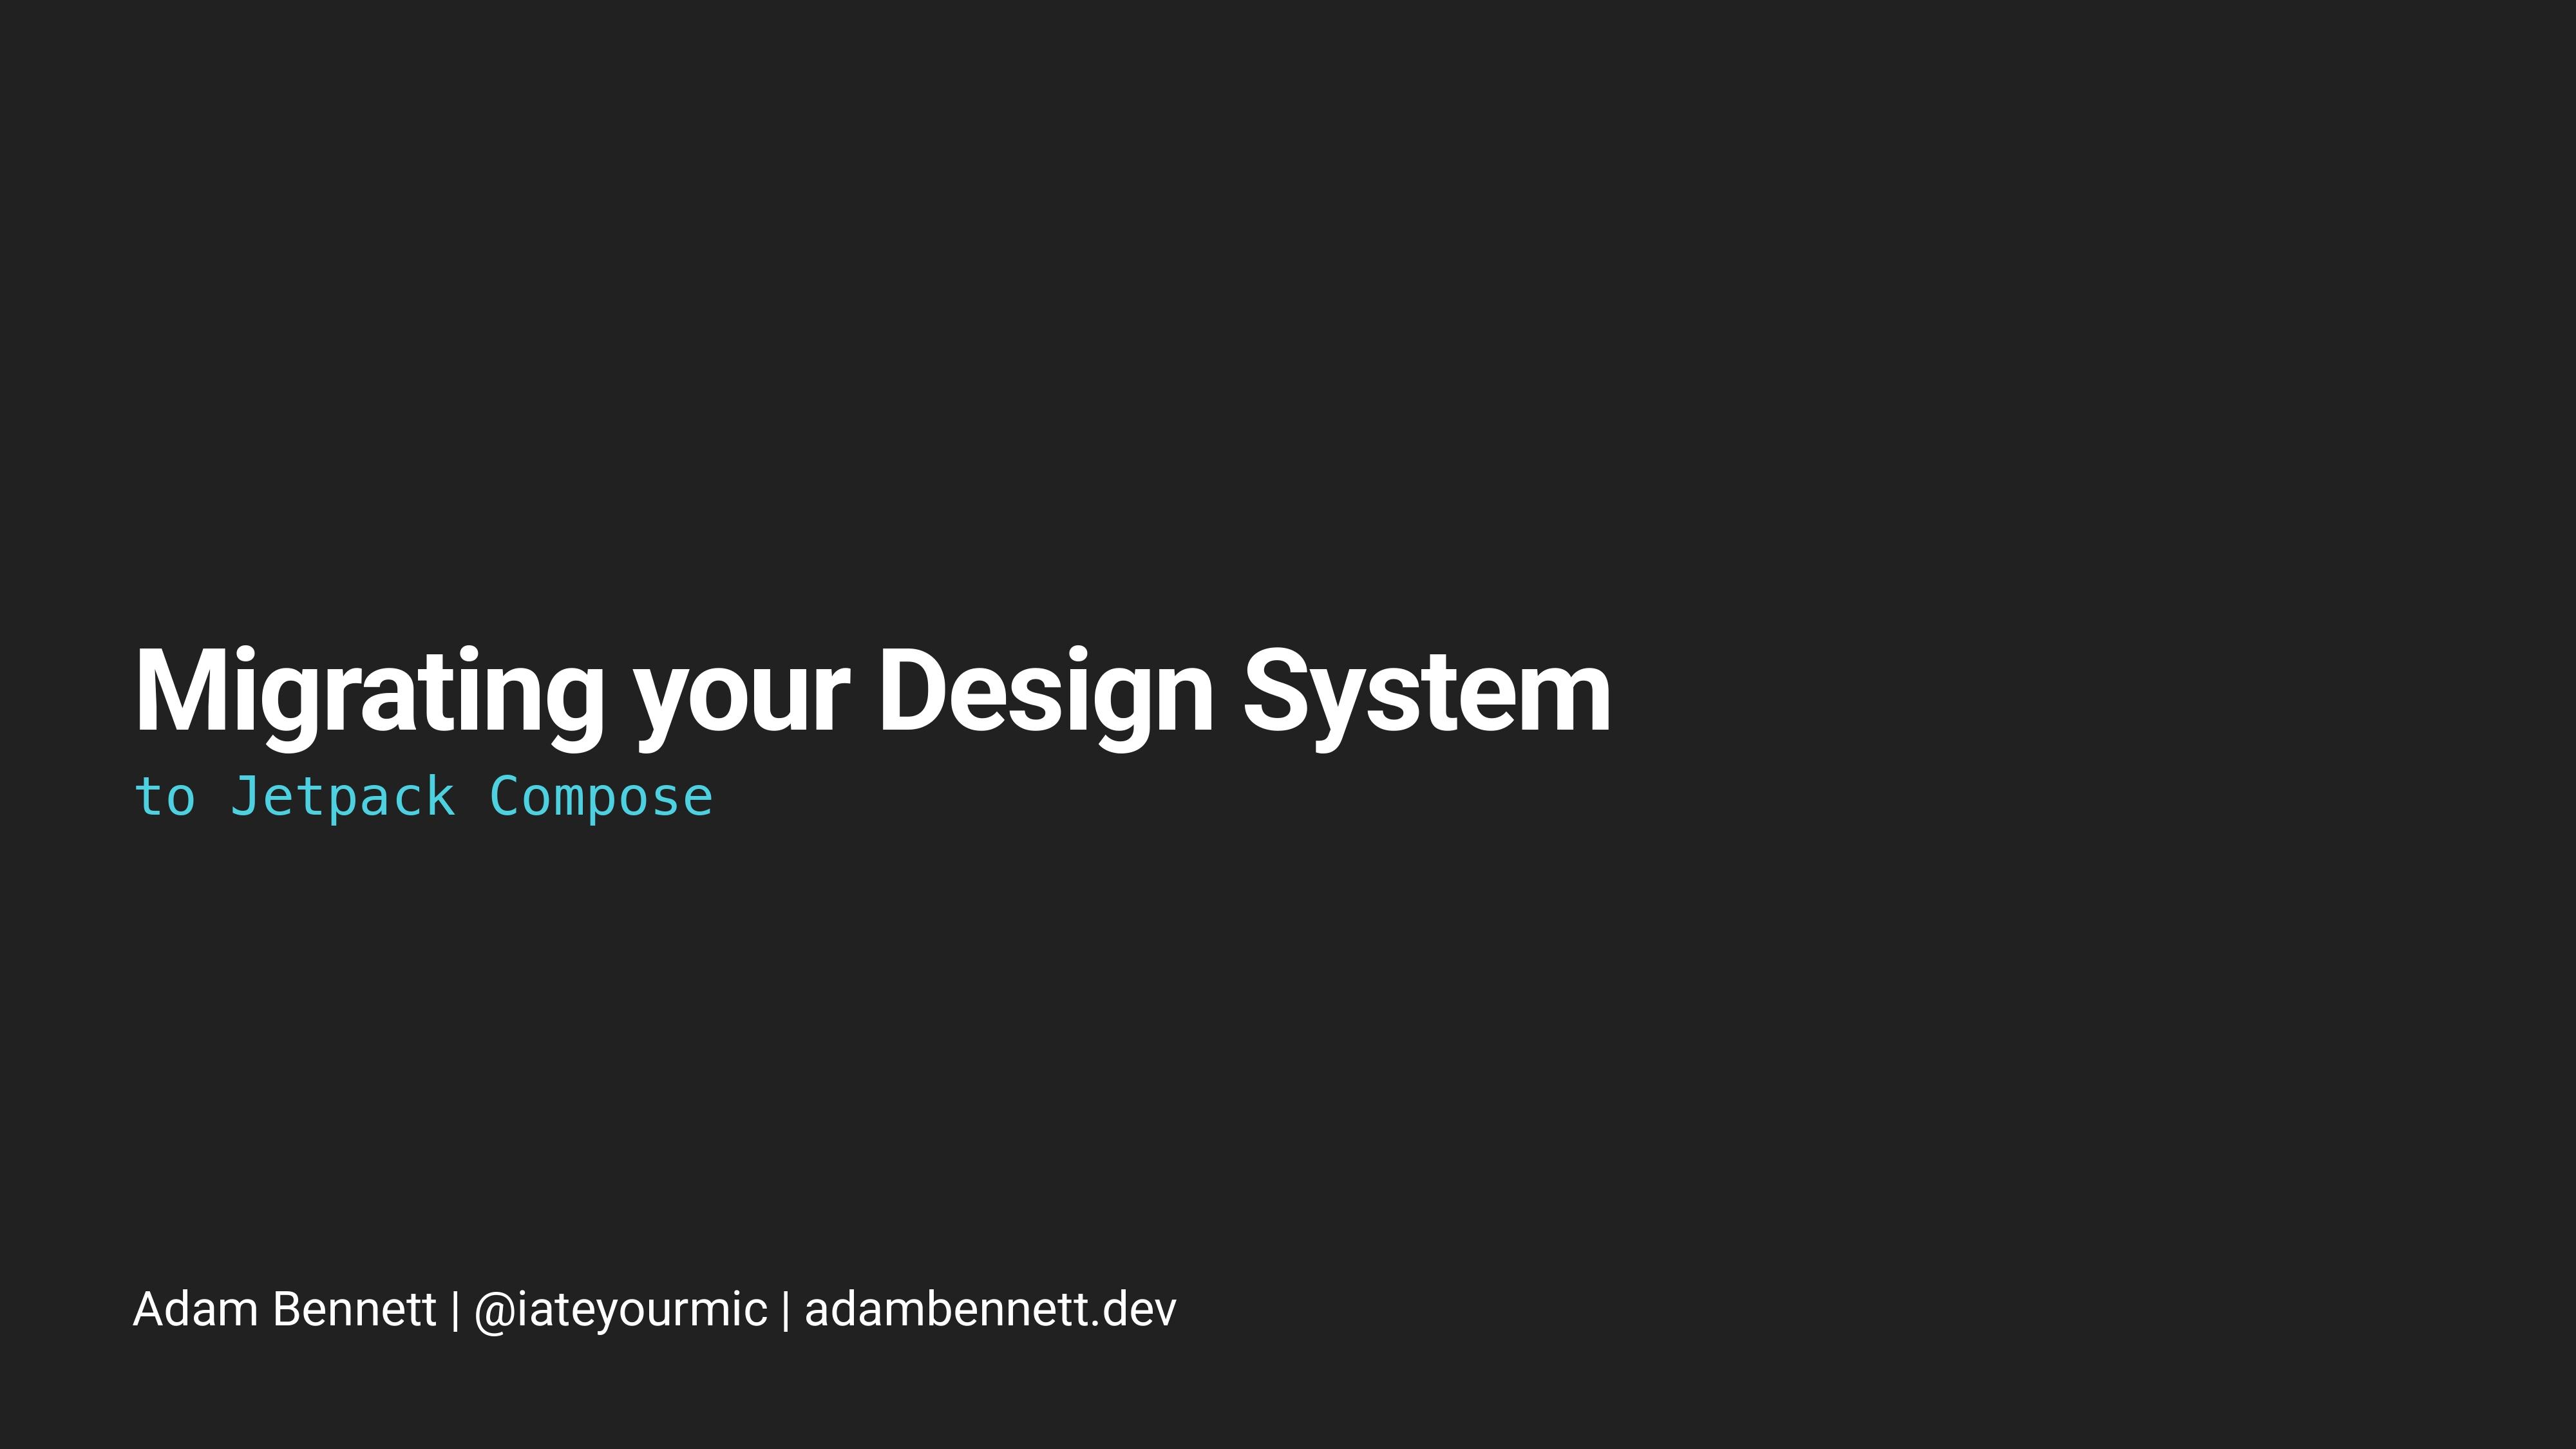 Migrating Your Design System to Jetpack Compose